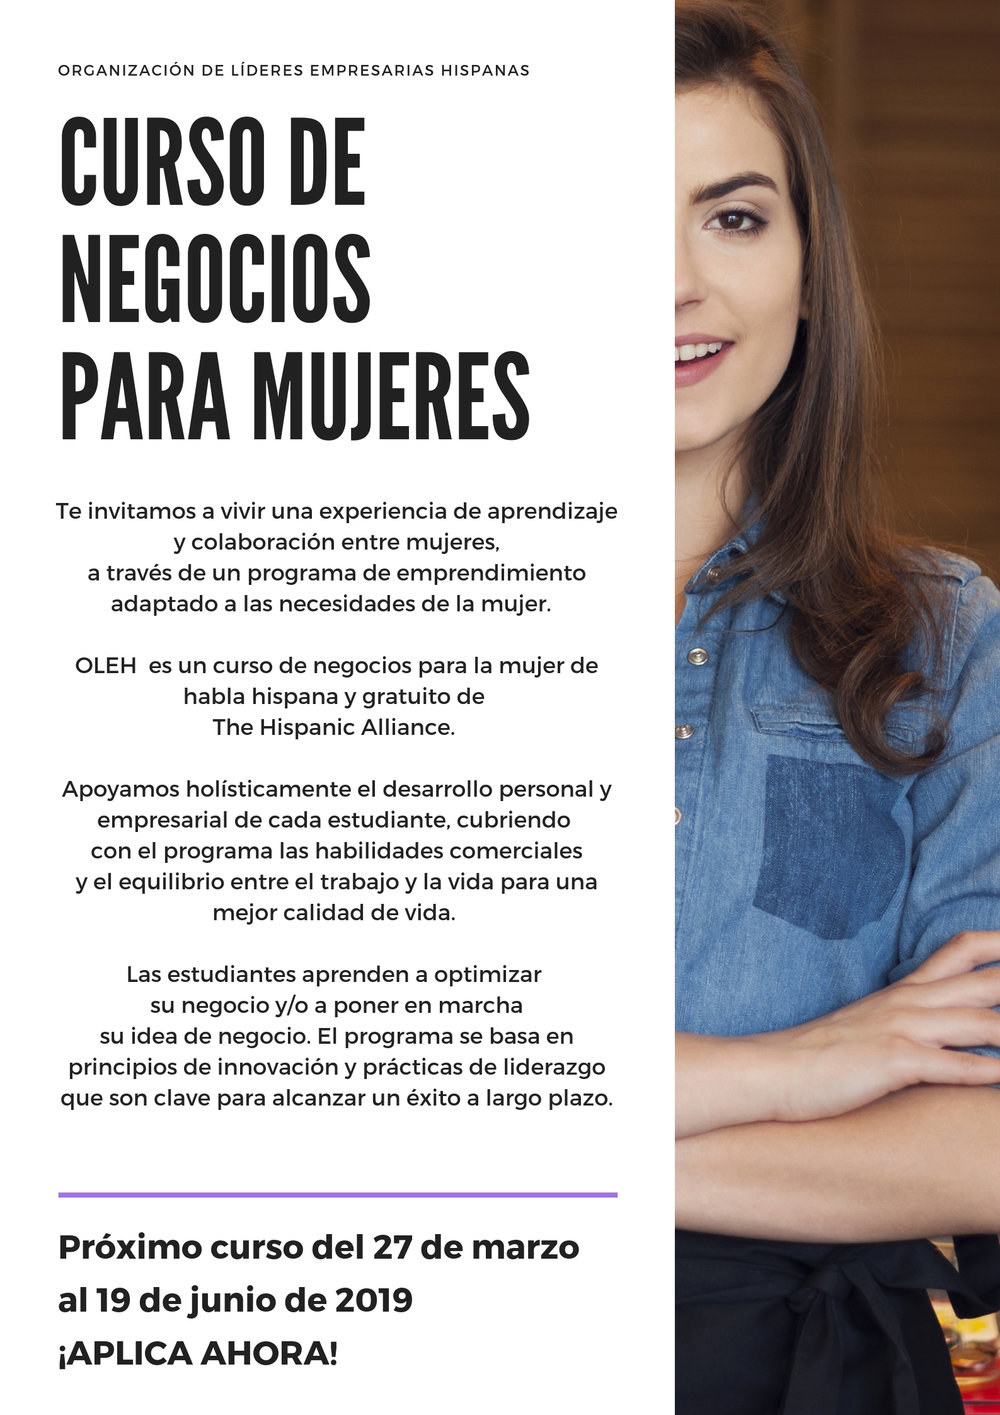 CURSO DE NEGOCIOSPARA MUJERES.jpg